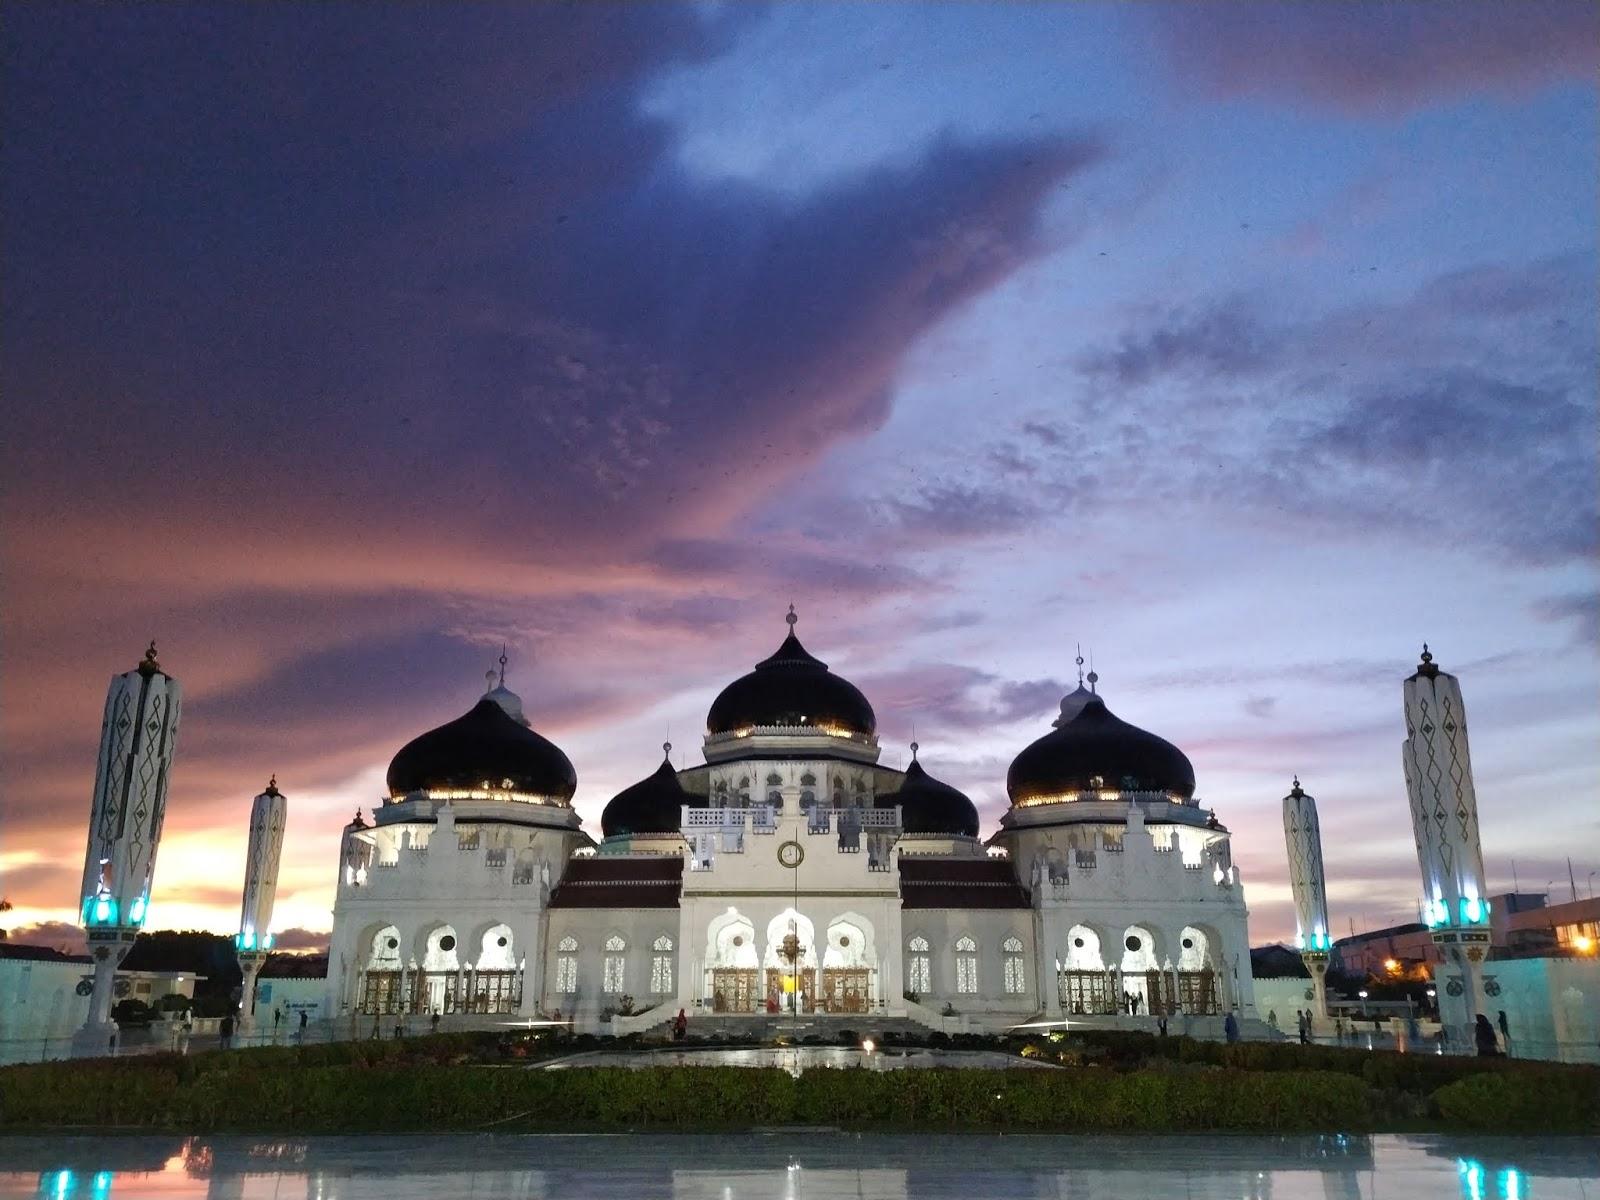 the Baiturrahman Grand Mosque in Aceh